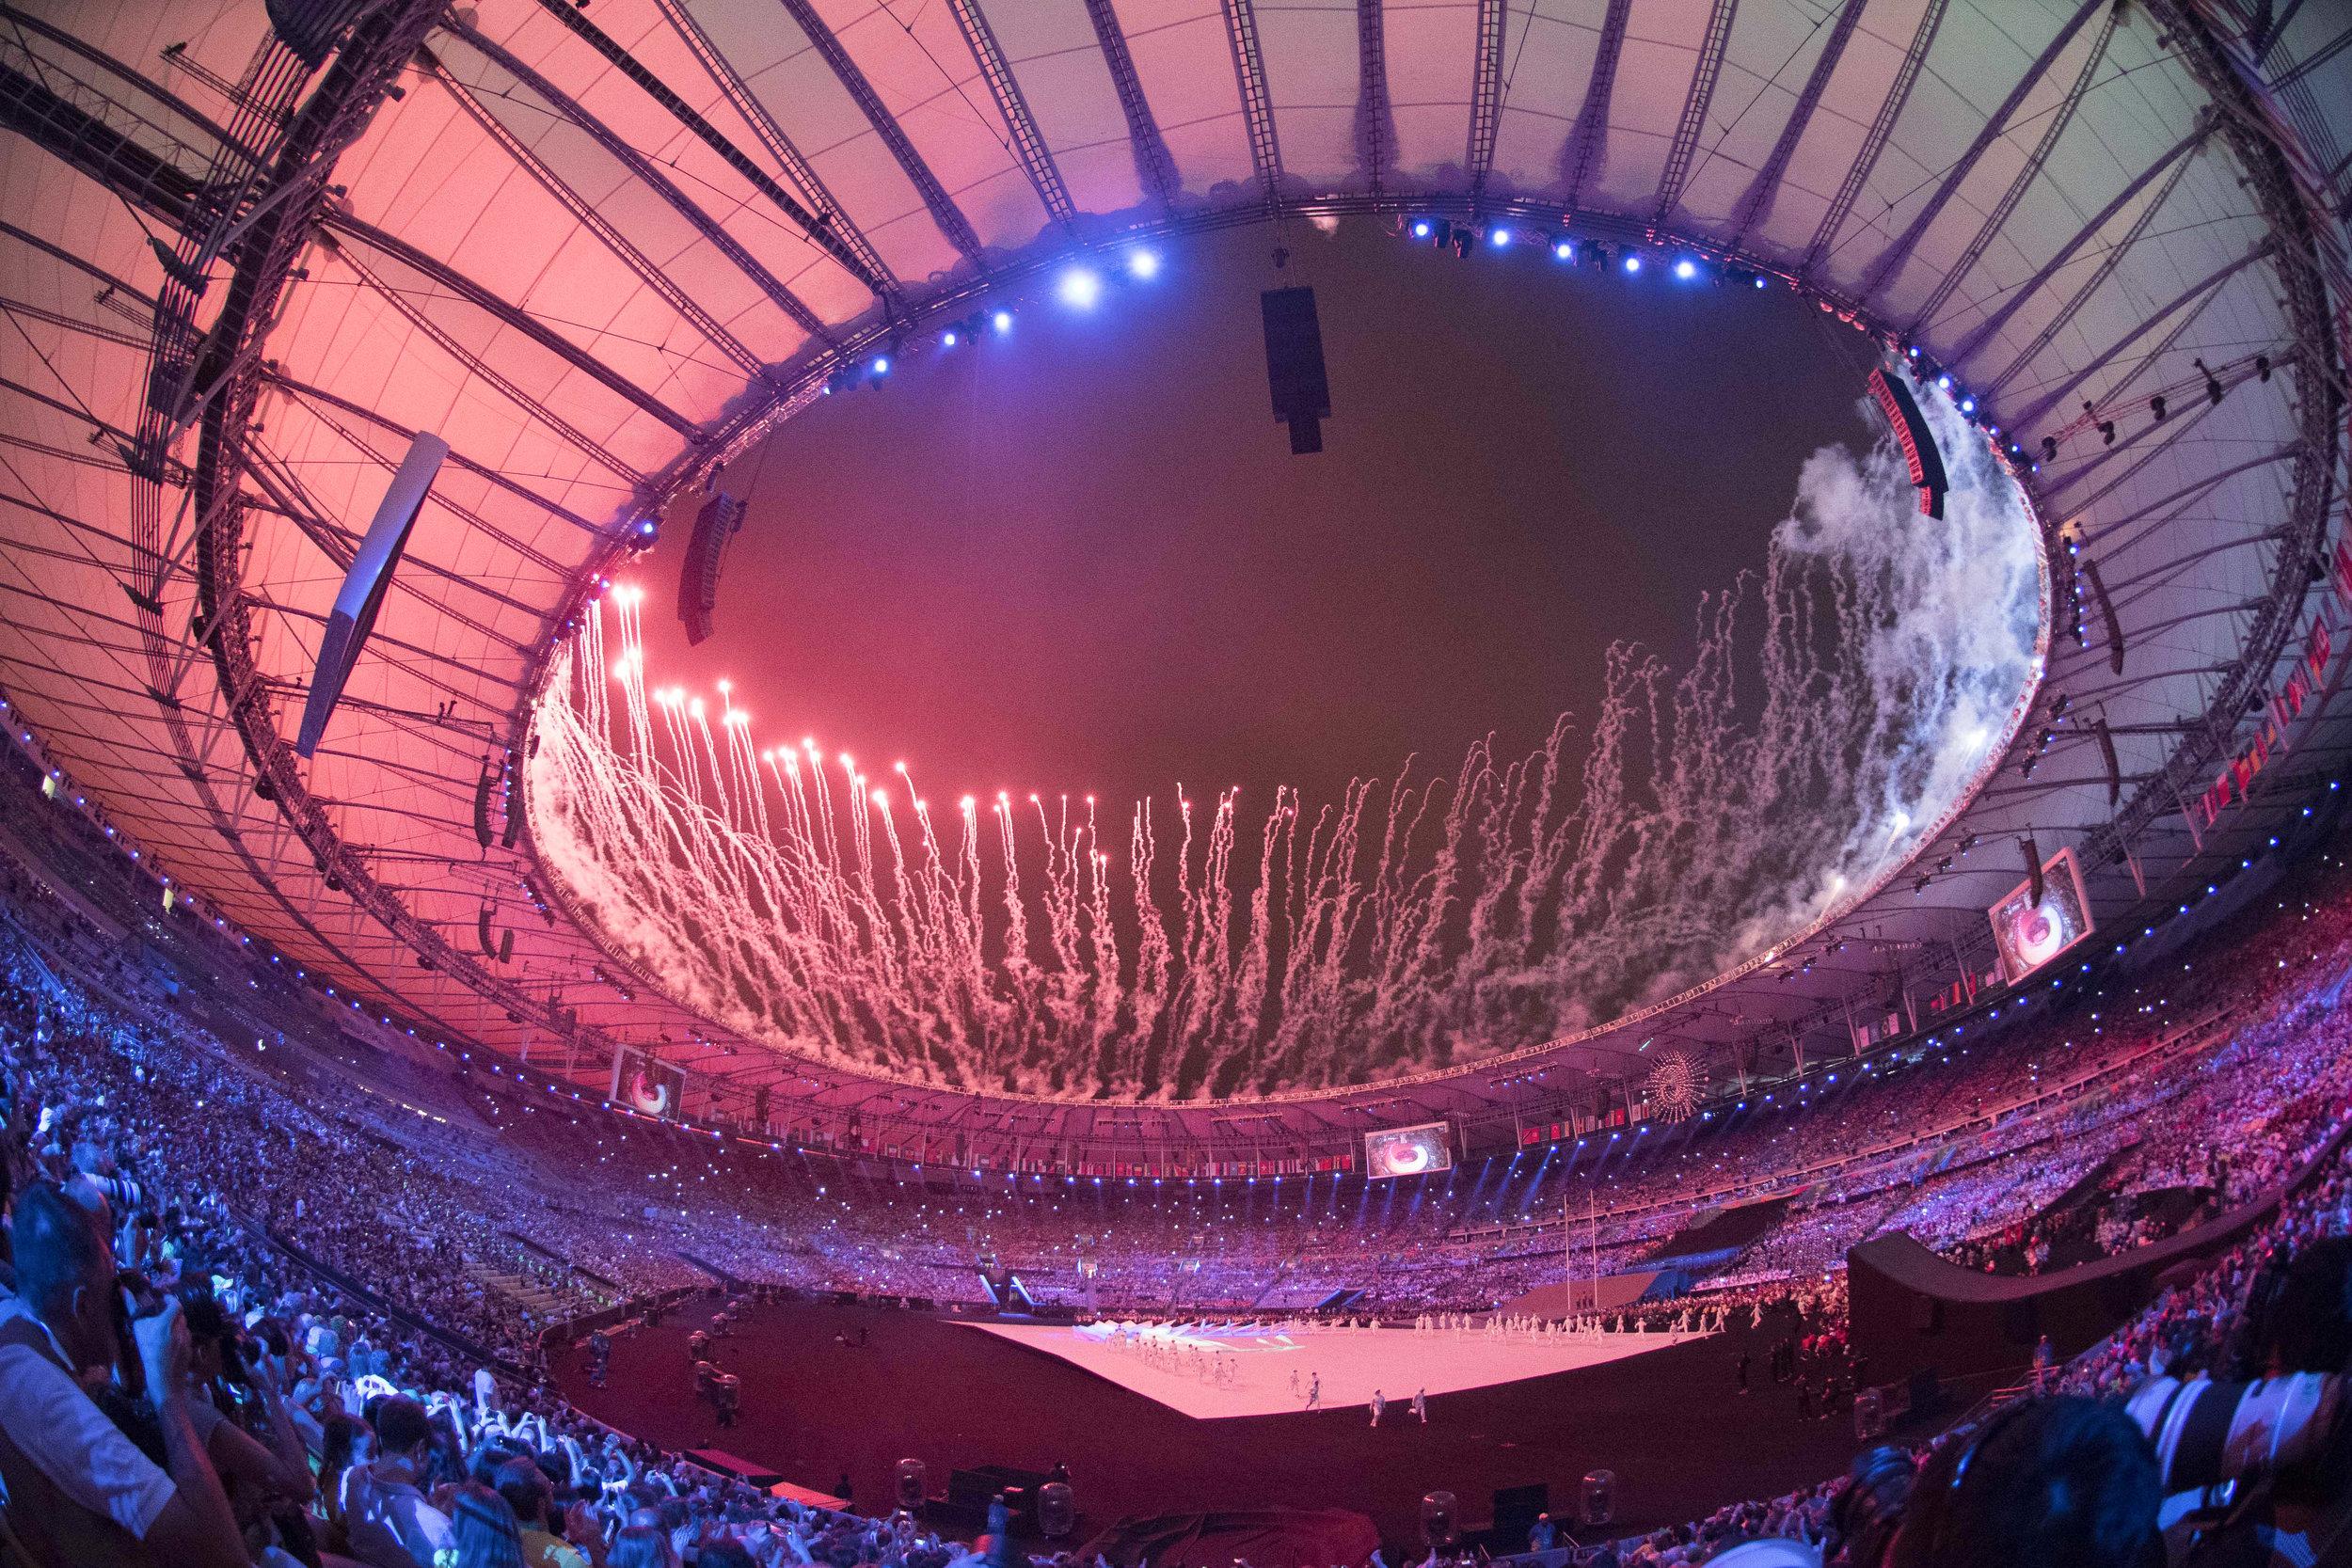 2016 Rio Paralympics Opening Ceremonies